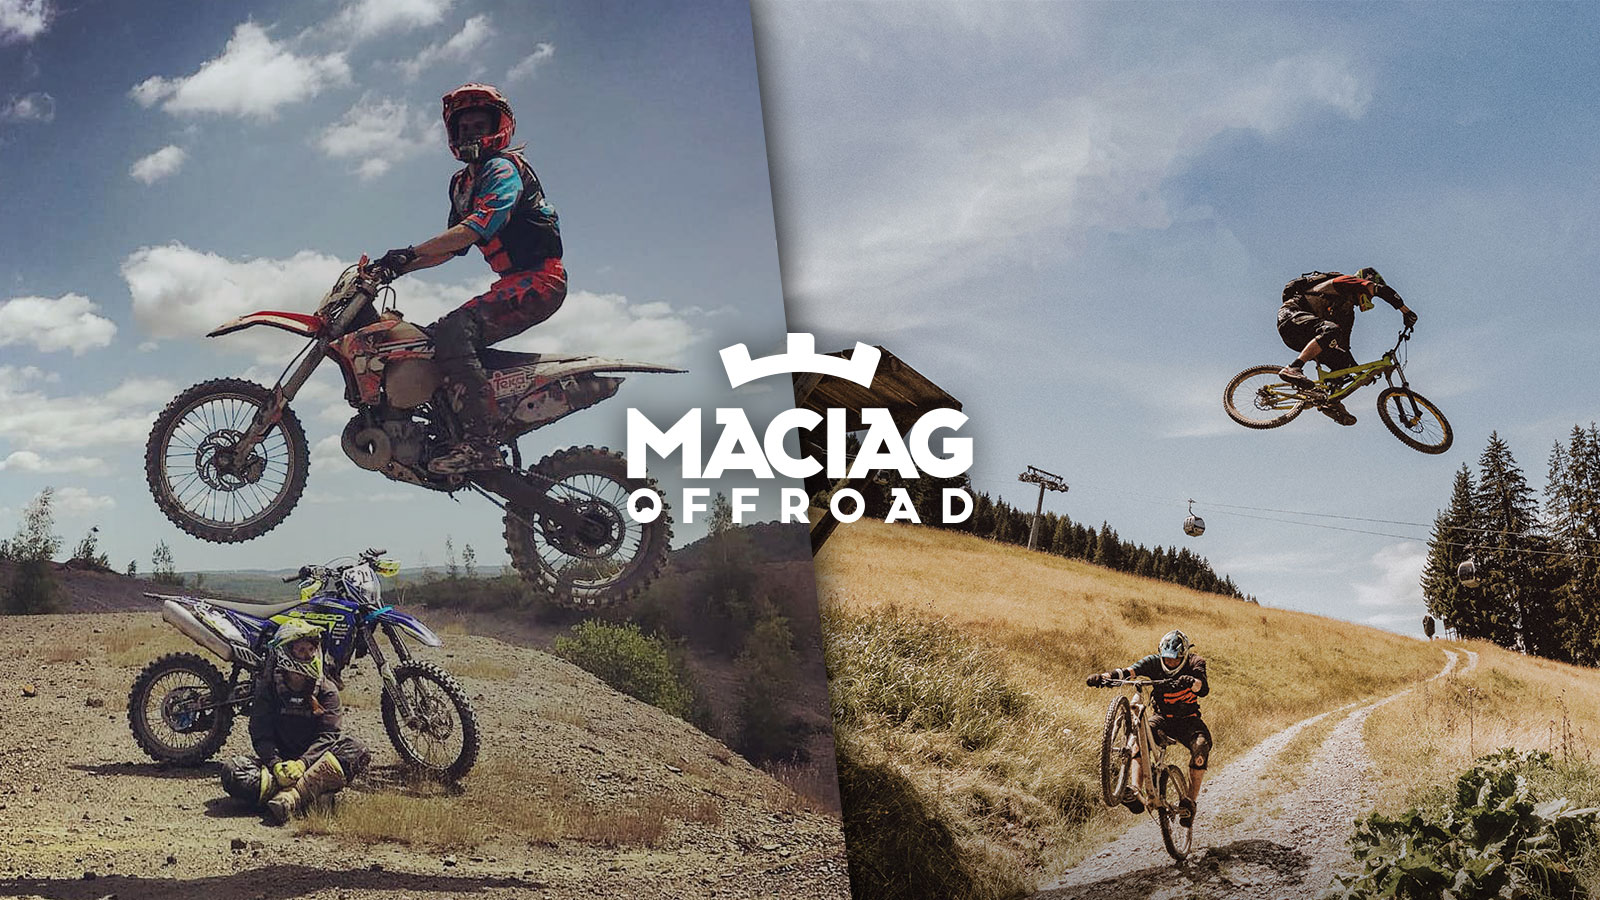 Maciag Offroad - YOUR SHOP FOR MOTOCROSS, MOUNTAIN BIKE AND STREETWEAR